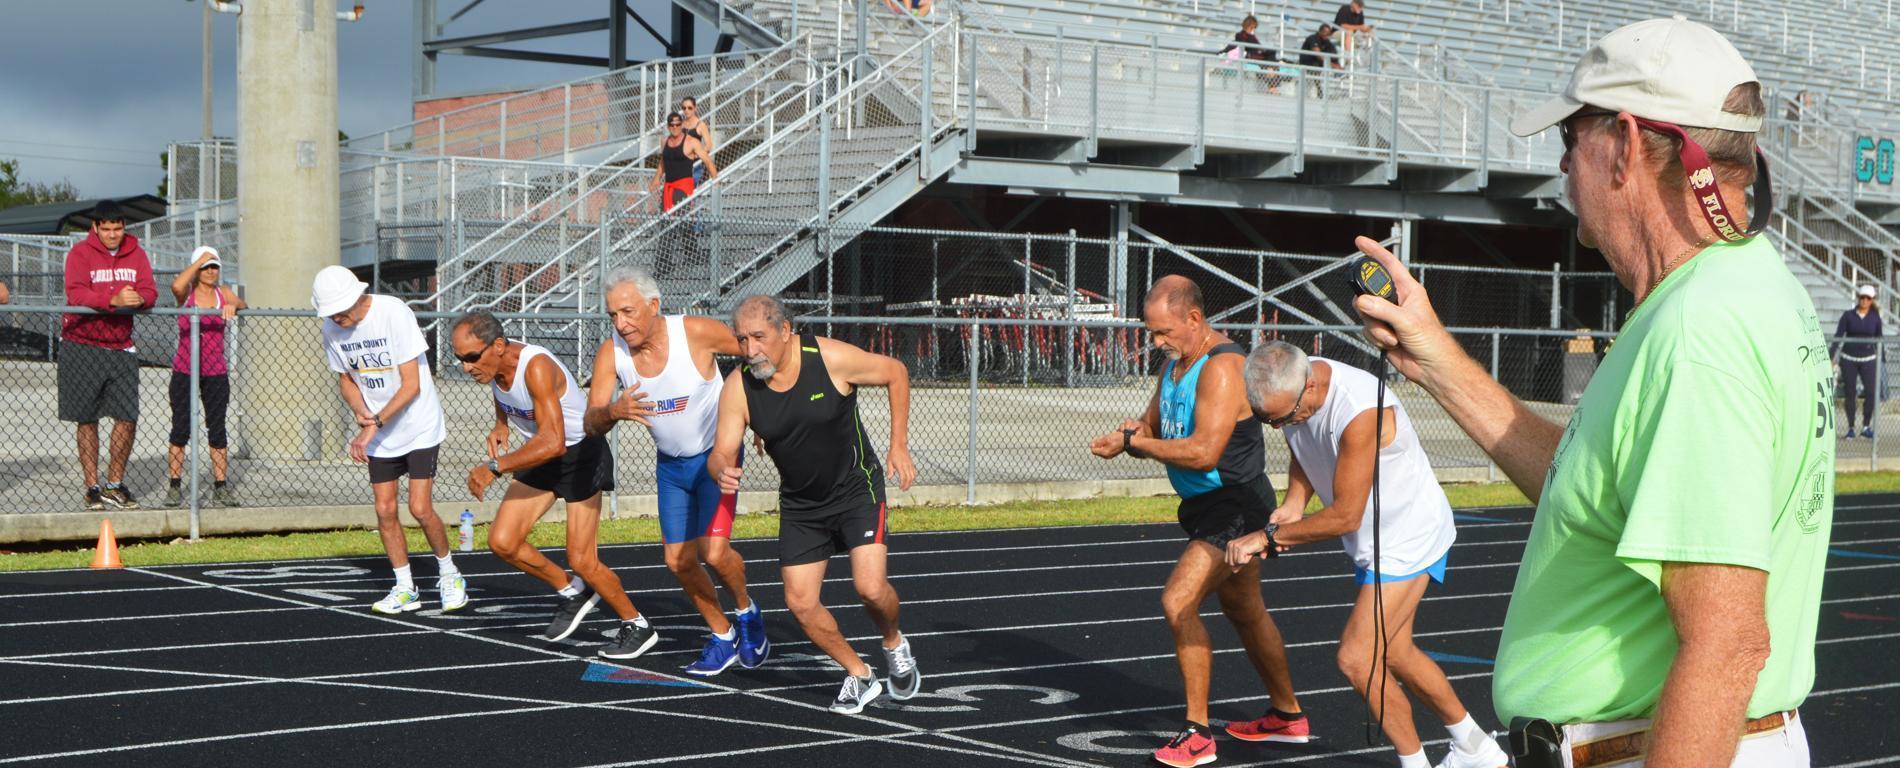 Martin County Senior Games participants running track.